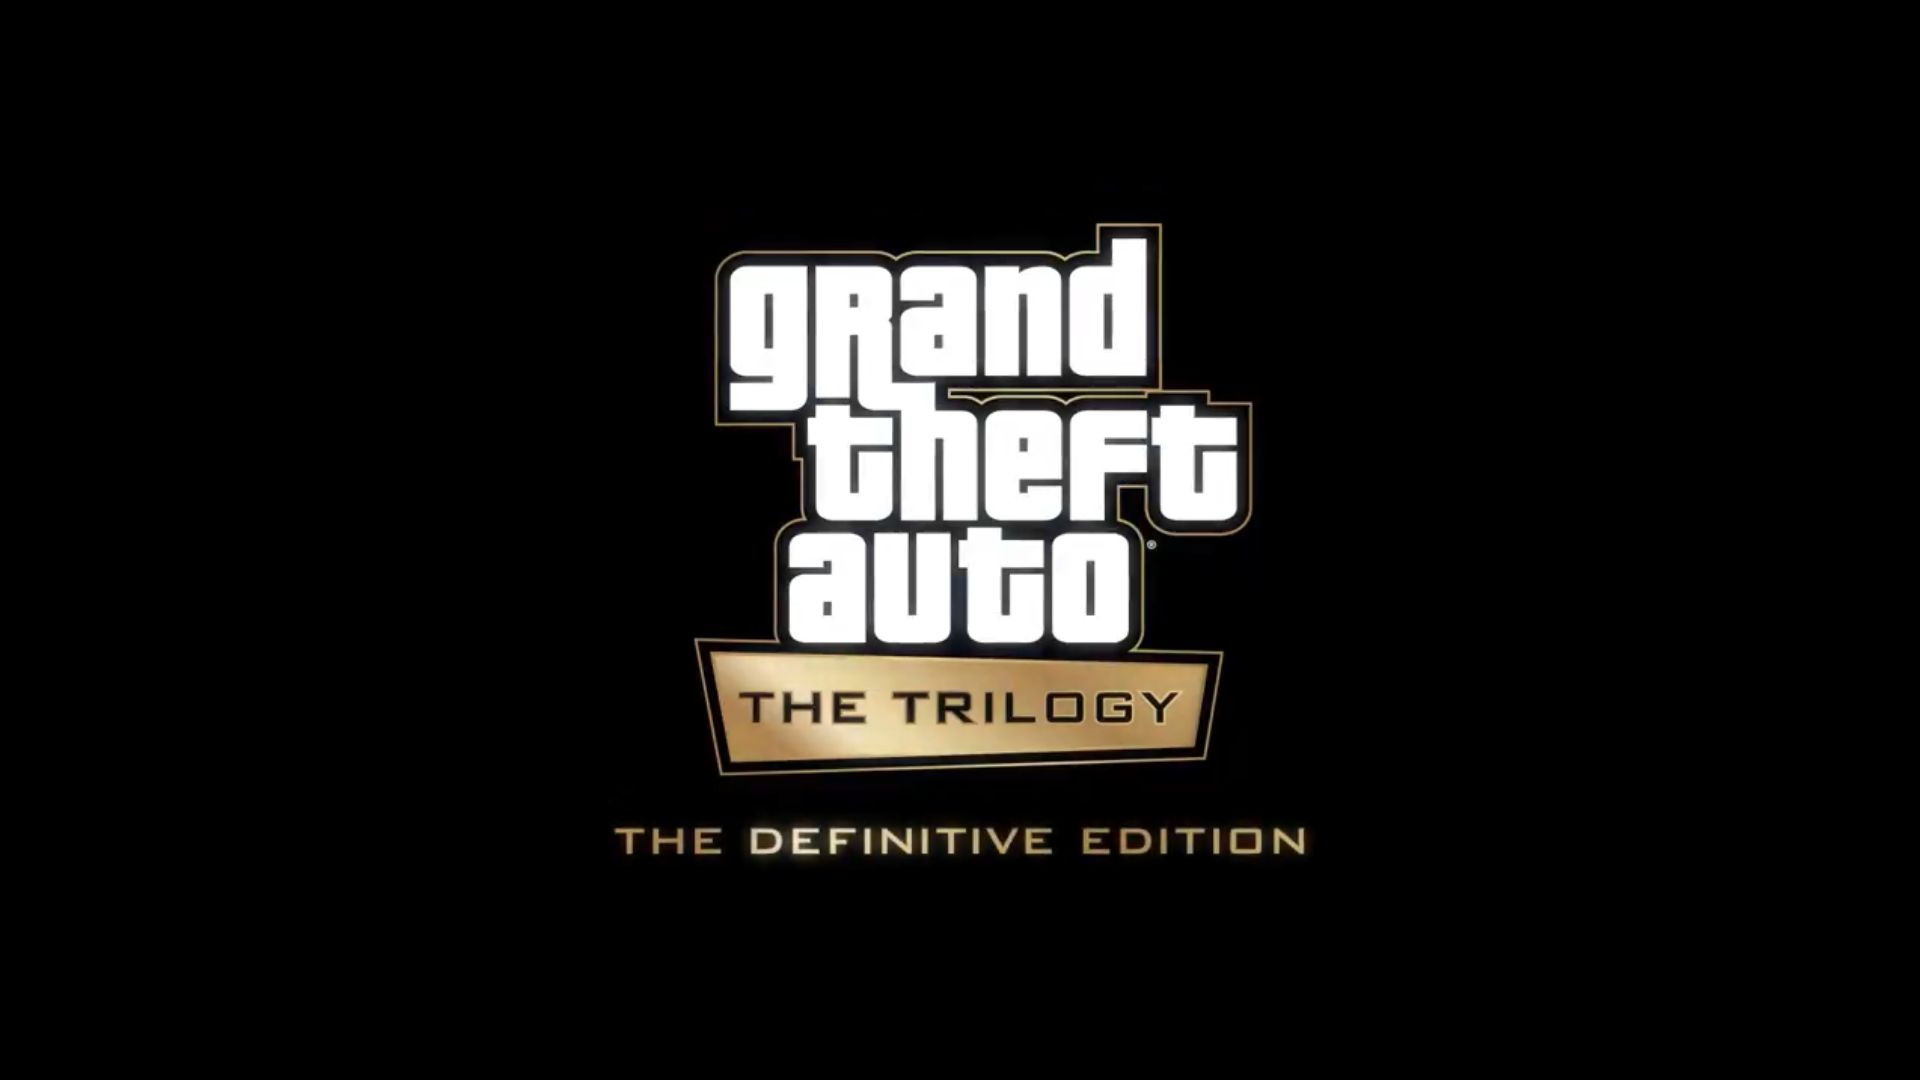 Grand Theft Auto GTA The Trilogy: The Definitive Edition es anunciado oficialmente